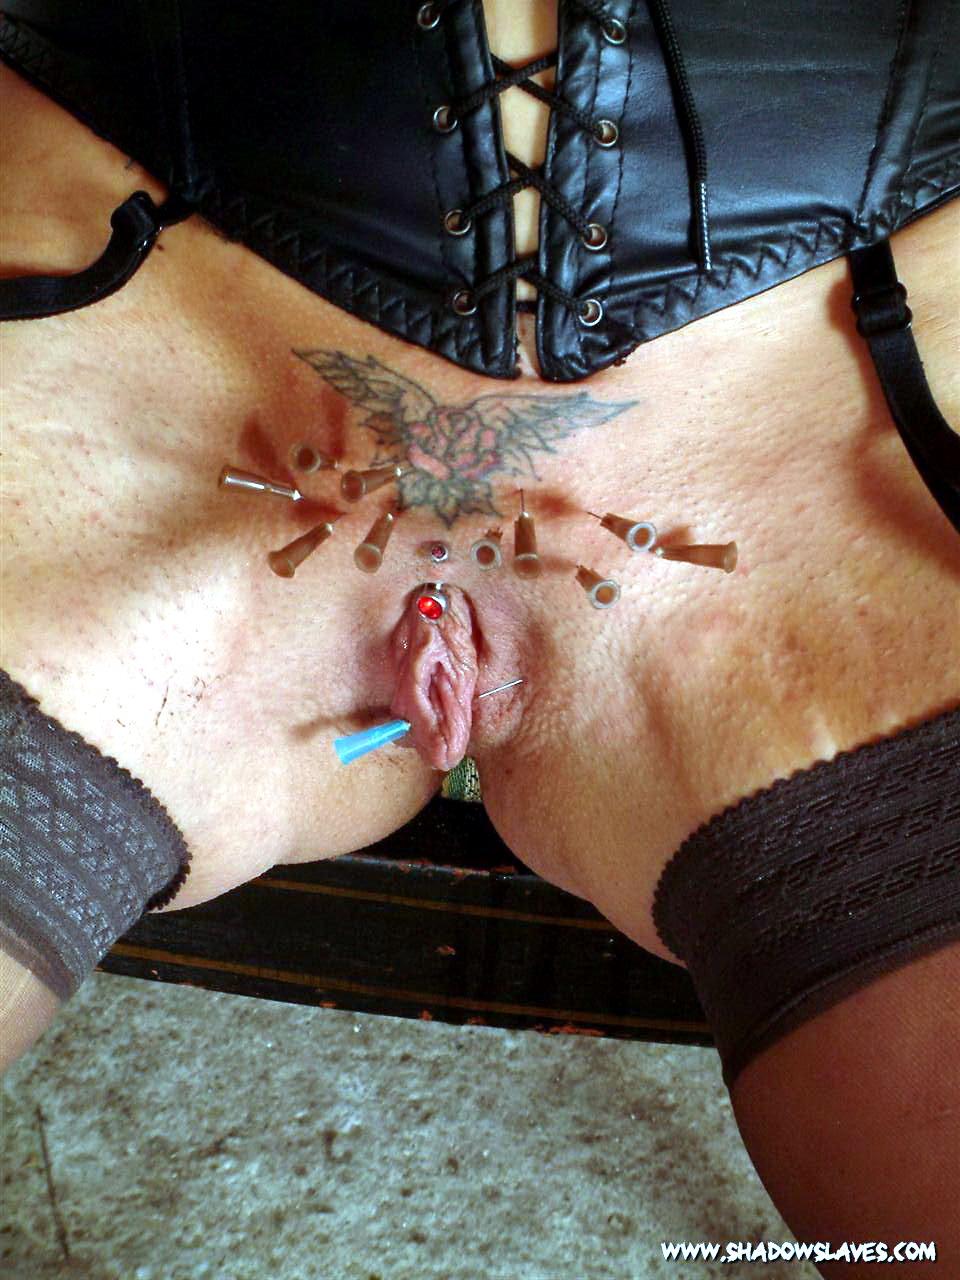 Well spank man